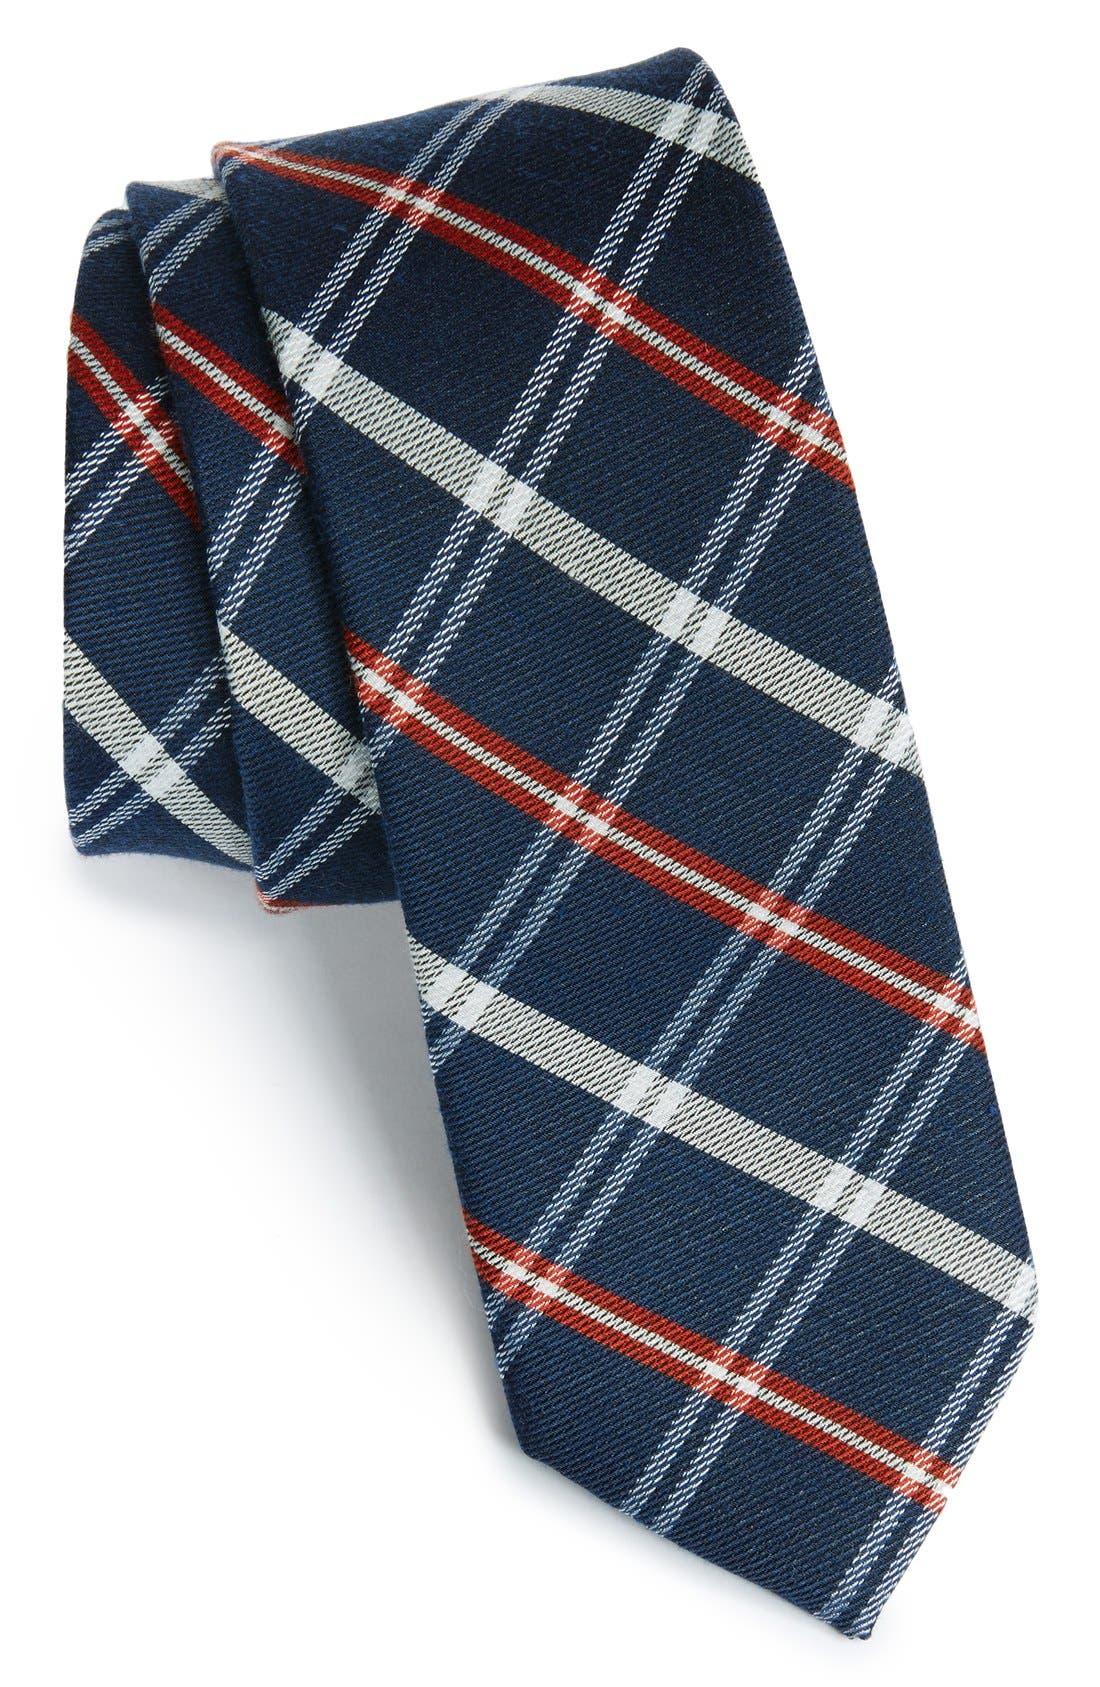 'Logan' Plaid Tie,                         Main,                         color, Navy